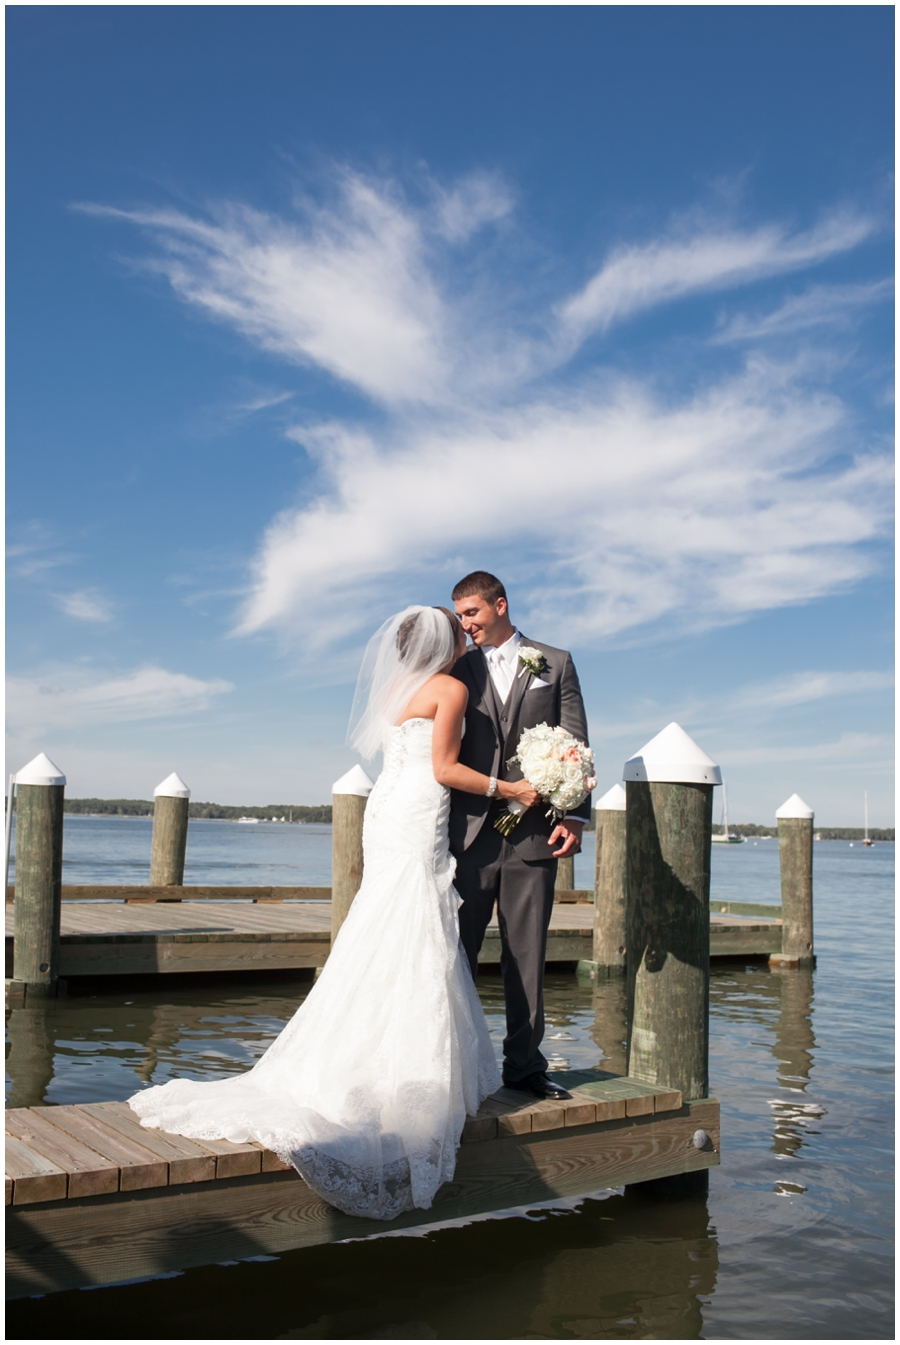 Eastern Shore Wedding Photographer - Best wedding photography of 2013